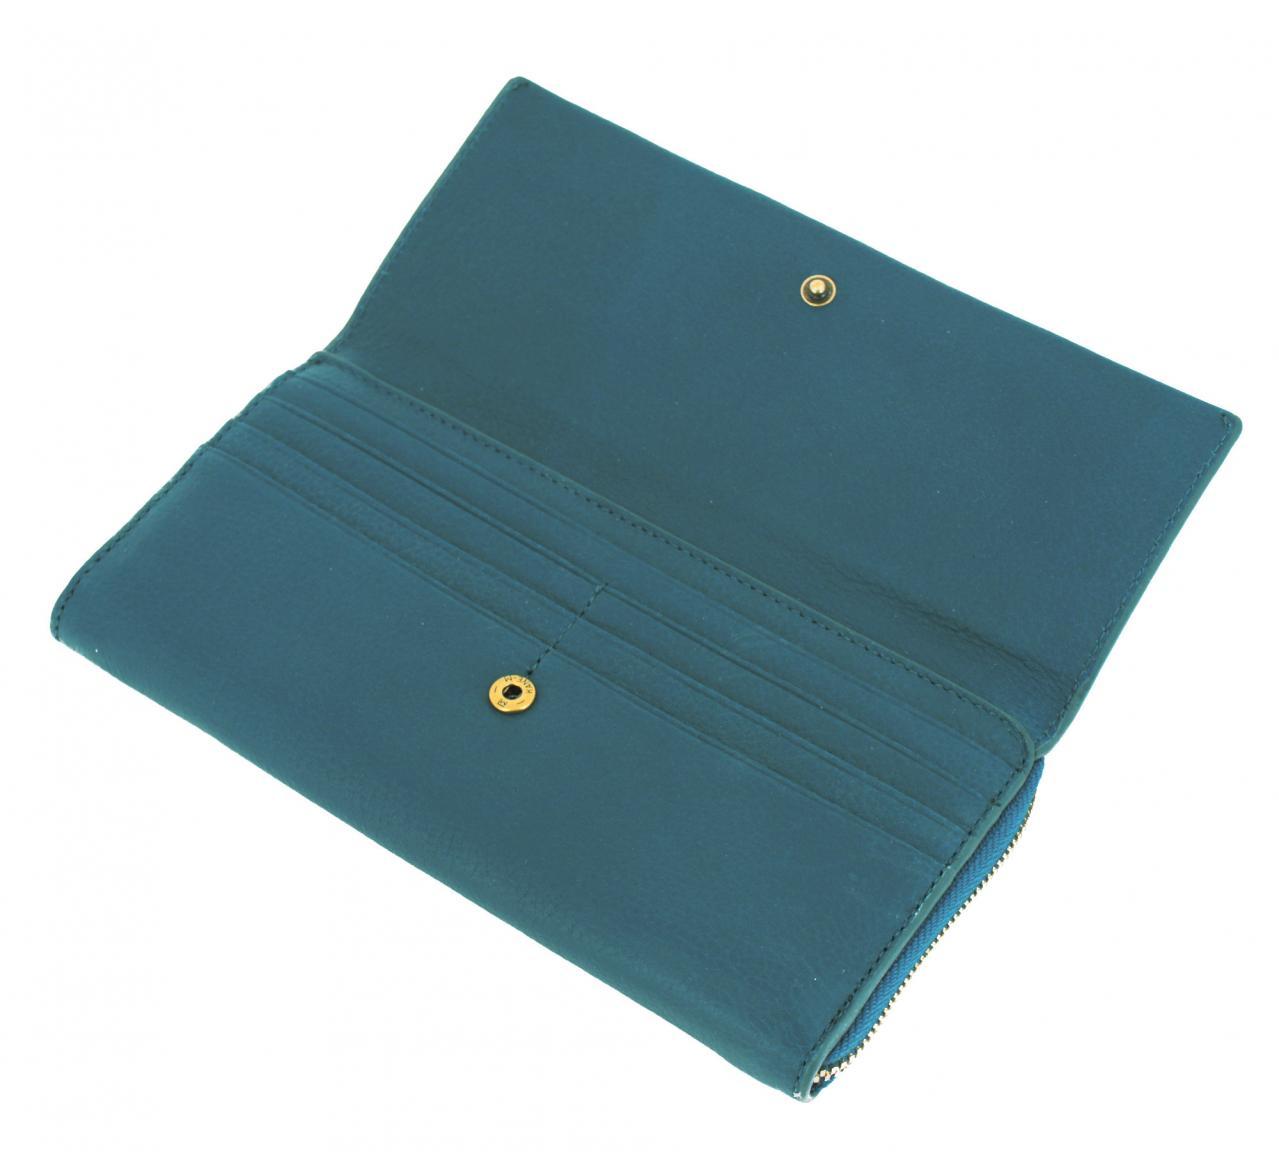 bbdd8b95a238c Portemonnaie Inja Marc O Polo Fuchsia Red Überschlag Zip - Bags   more